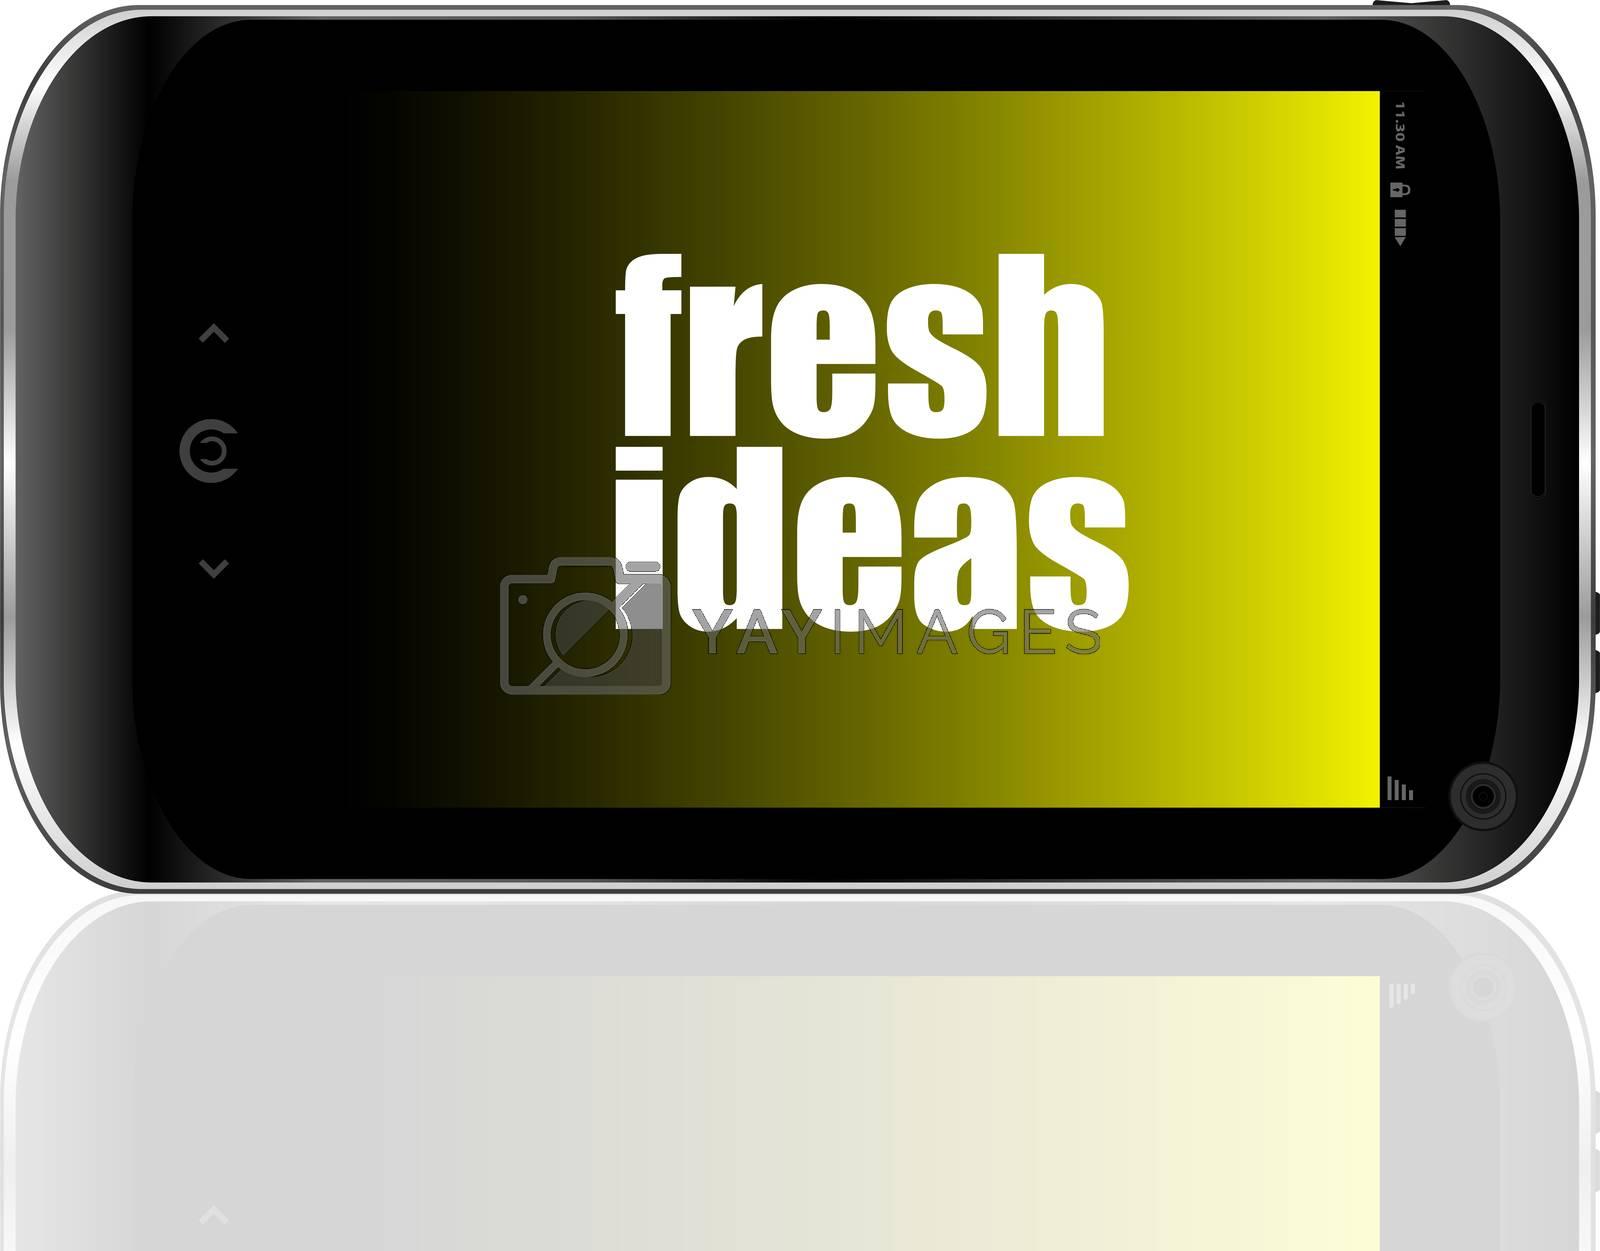 fresh ideas text. business concept . Detailed modern smartphone